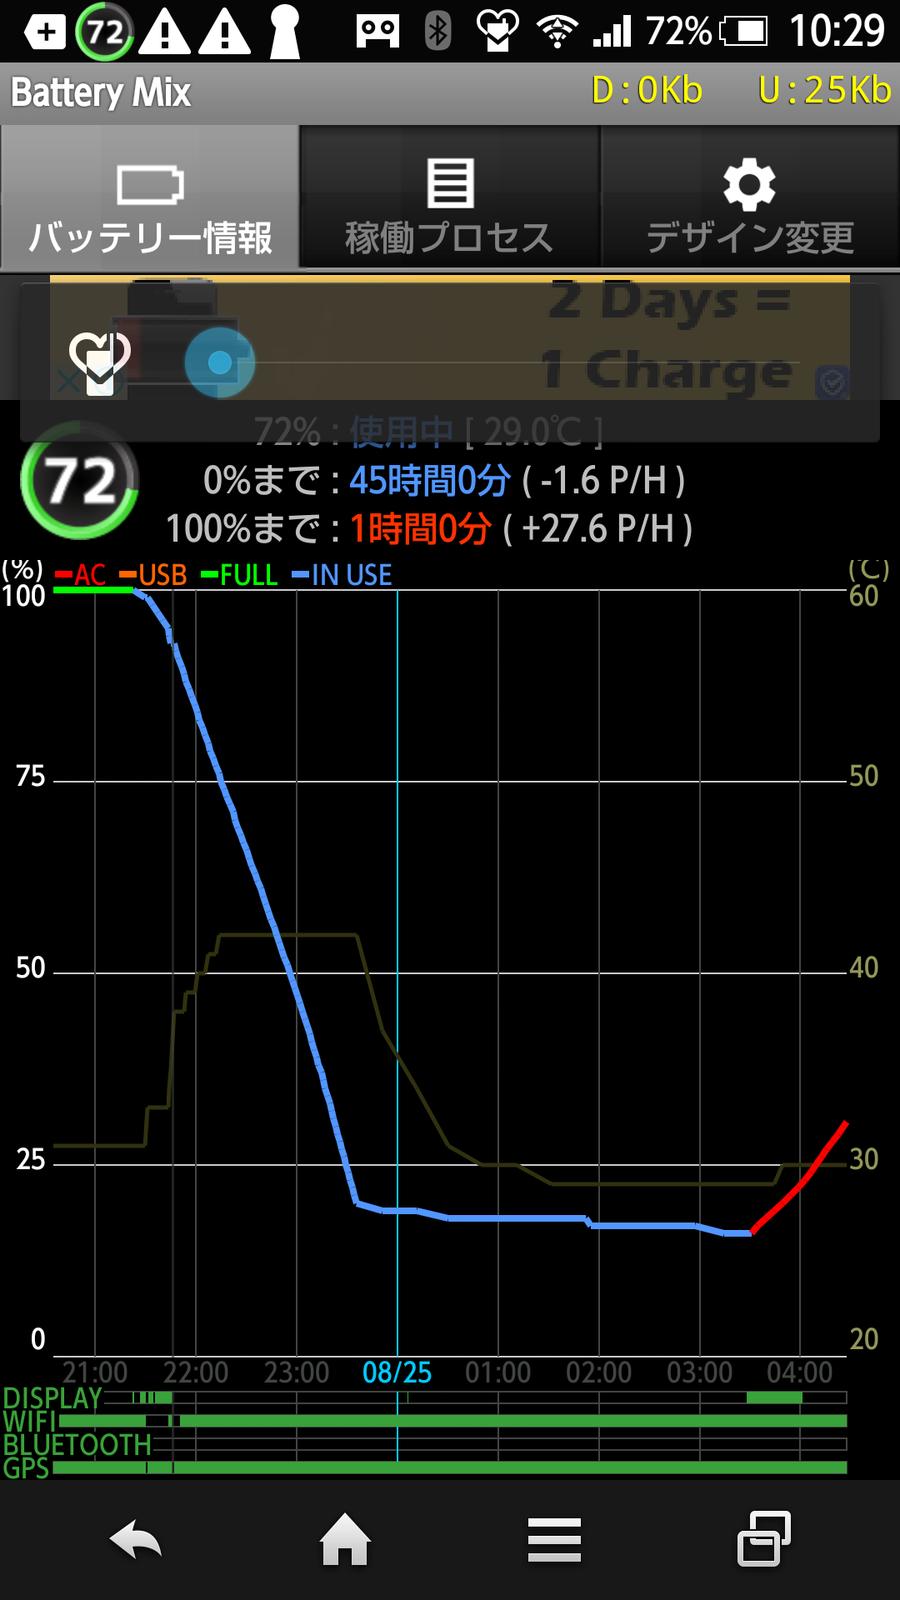 5_battery_mix